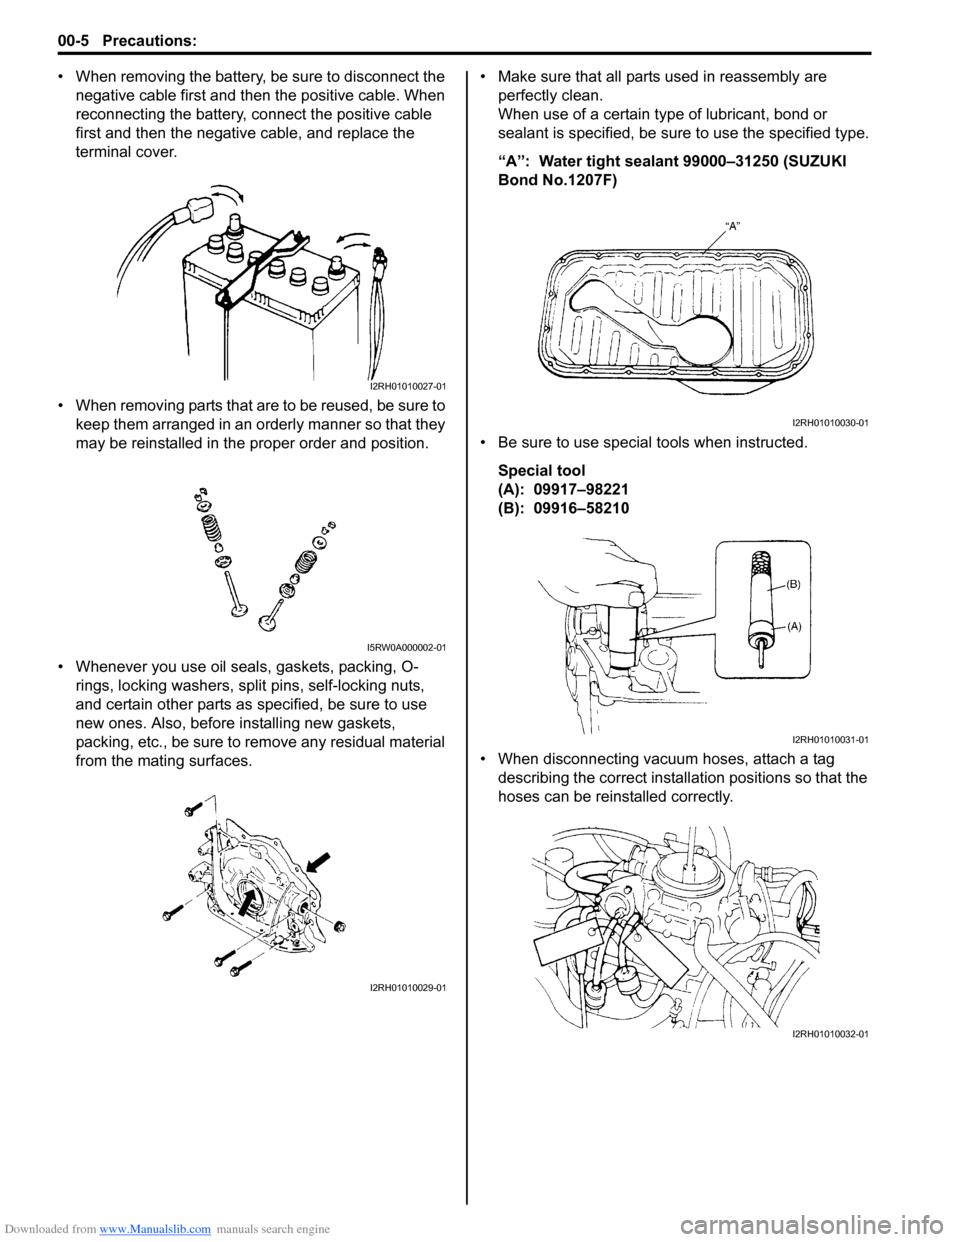 suzuki 2010 sx4 sedan owners manual pdf download autos post 2010 suzuki sx4 repair manual free download 2010 suzuki sx4 service manual